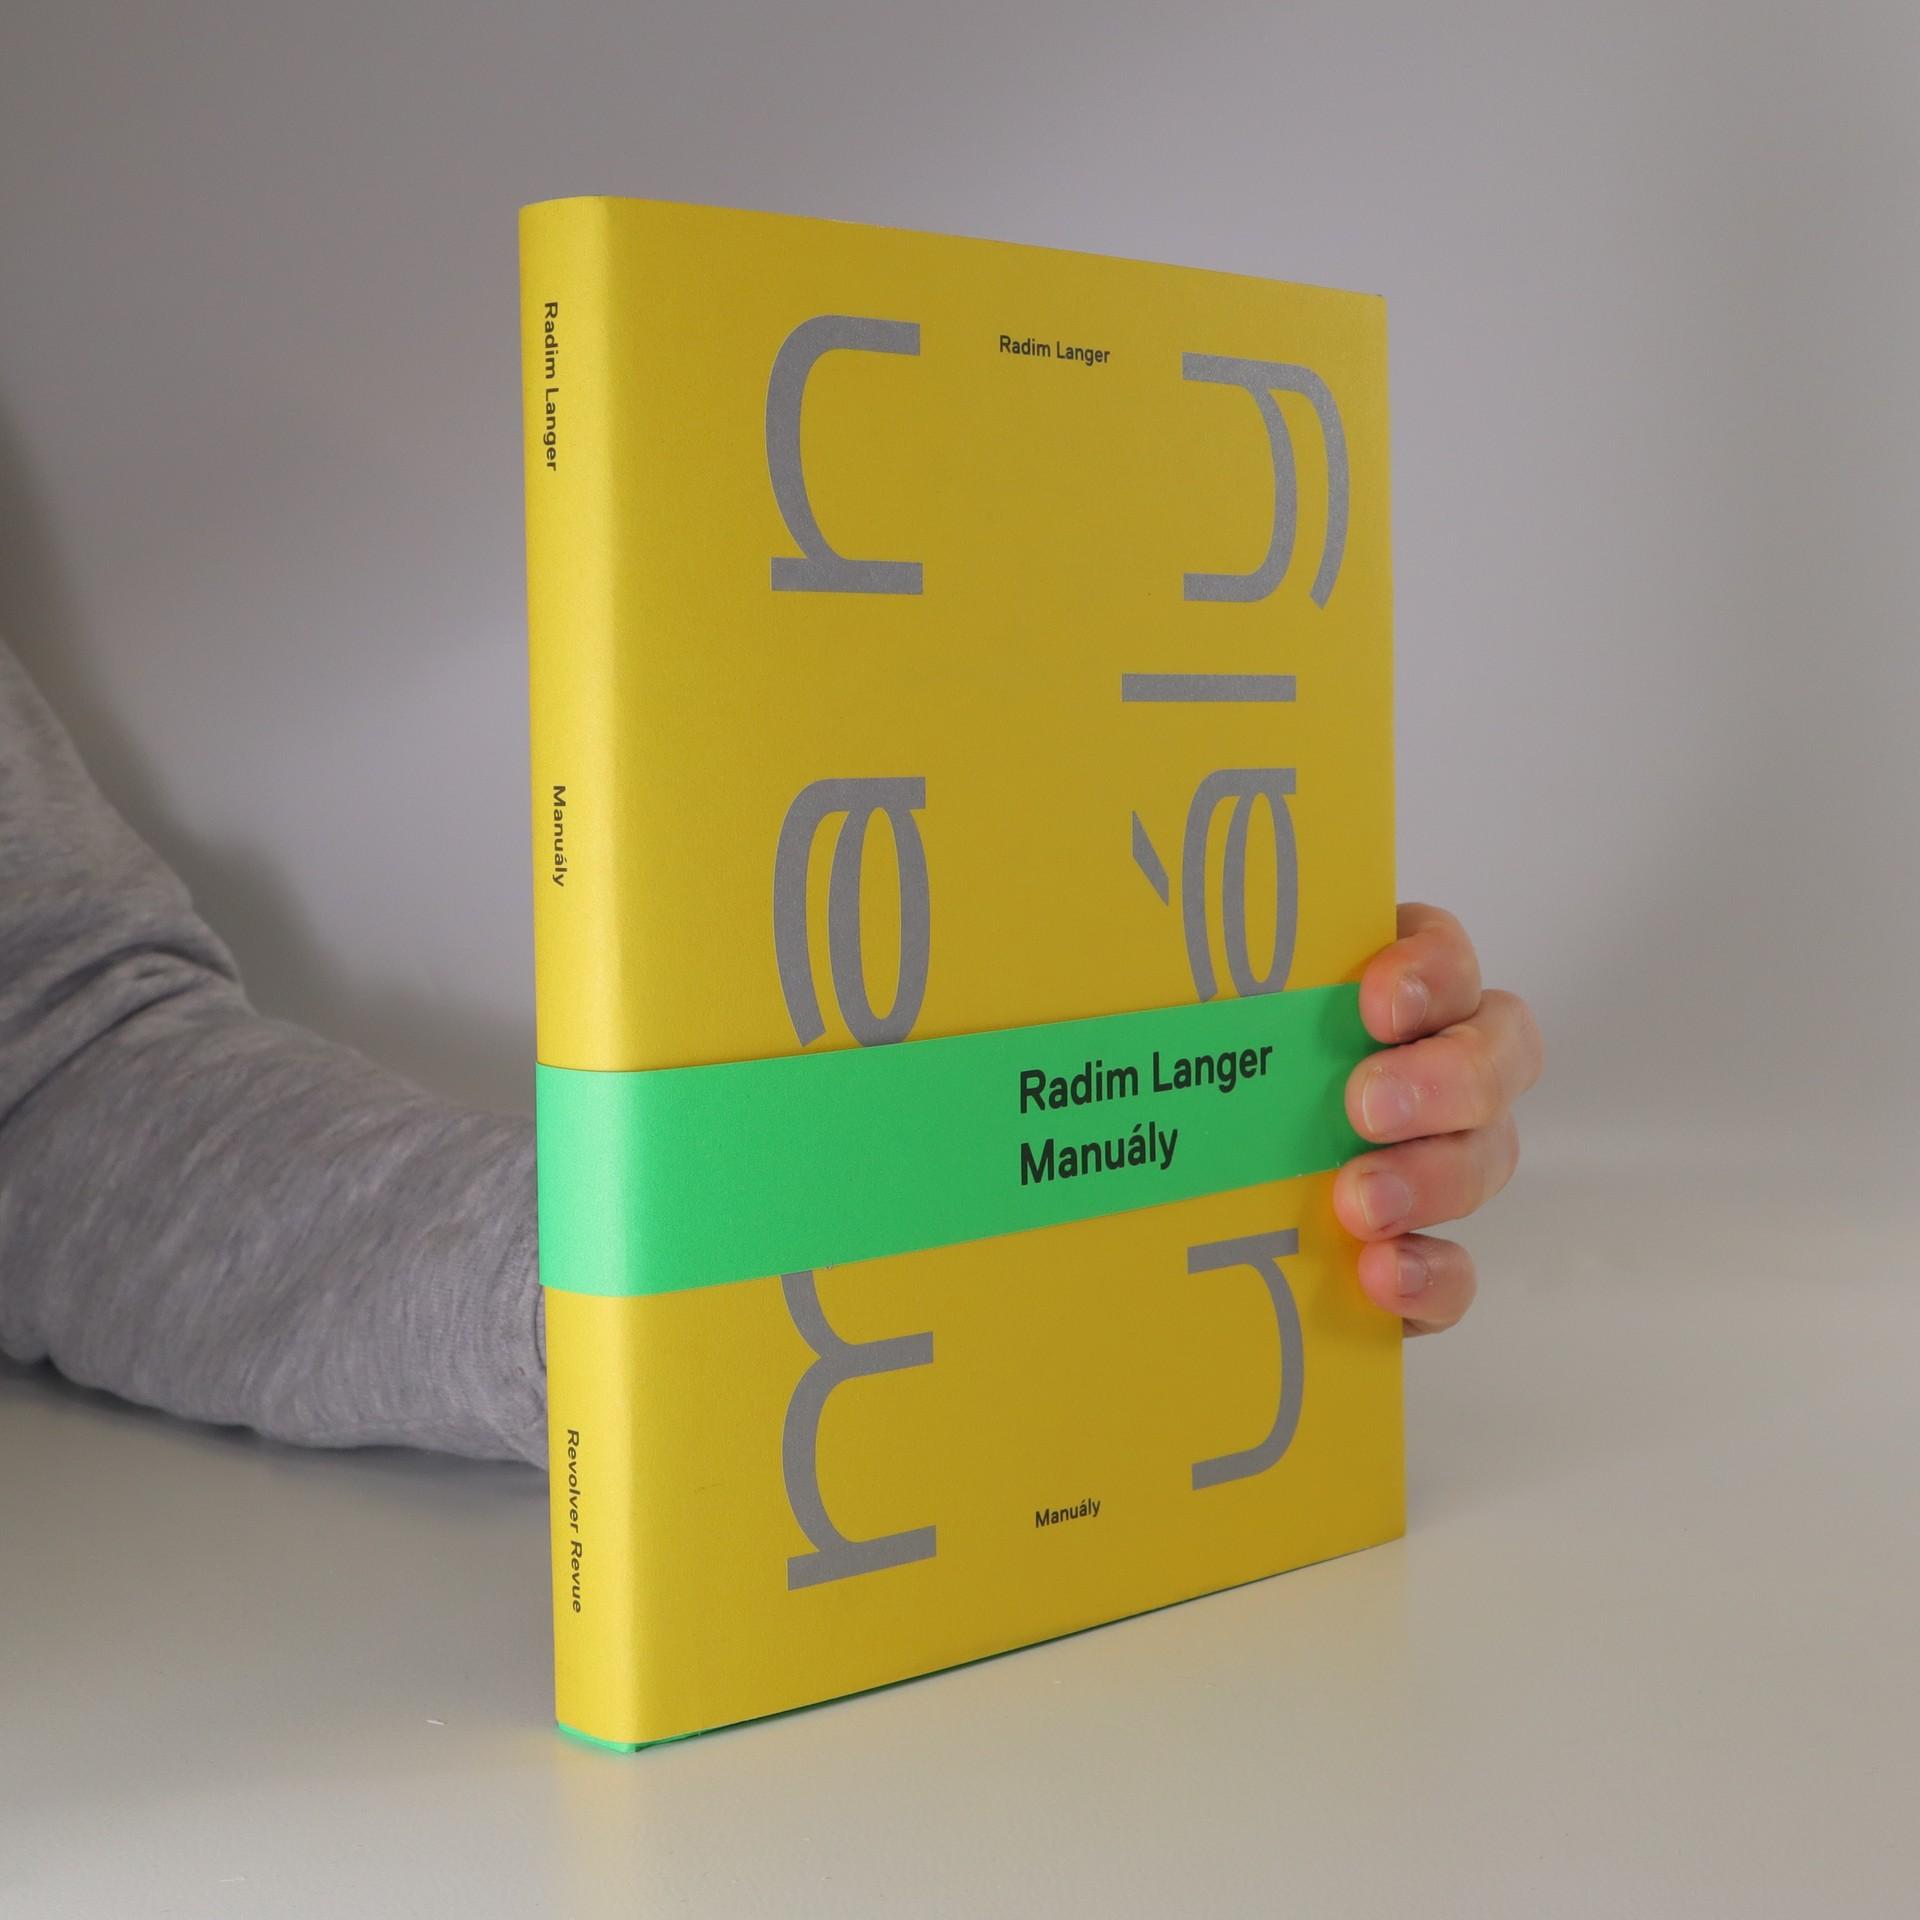 antikvární kniha Manuály, 2016